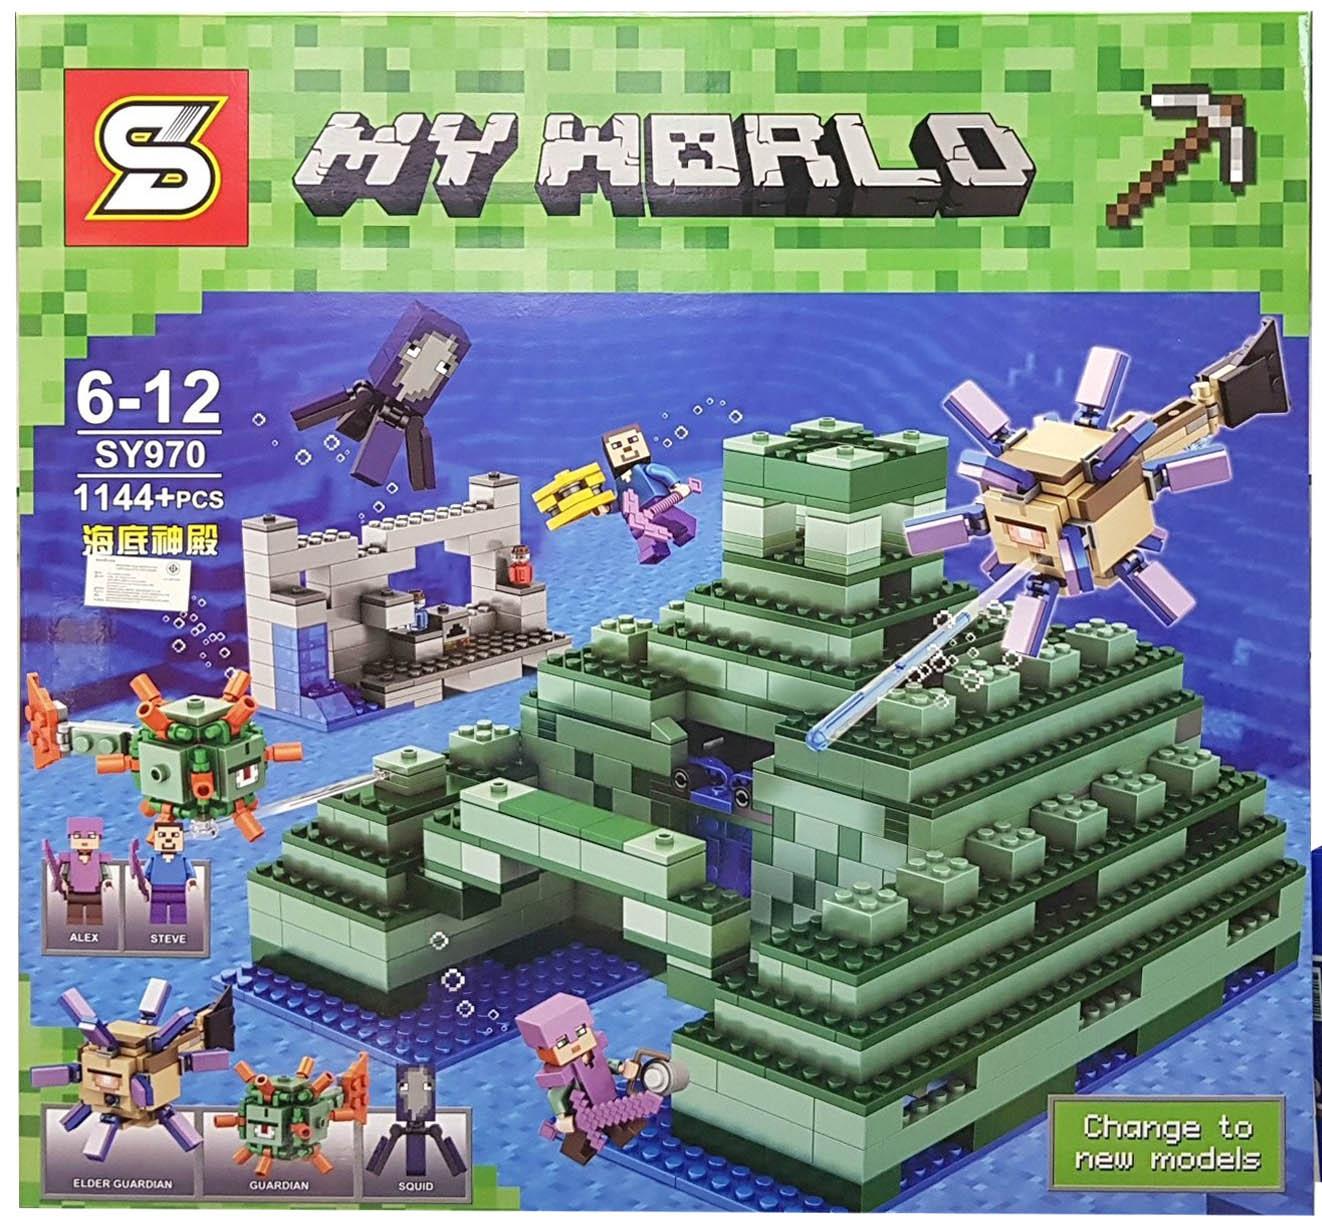 MINECRAFT เลโก้จีน SY 970 ชุด The Ocean Monument (1,144 ชิ้น )